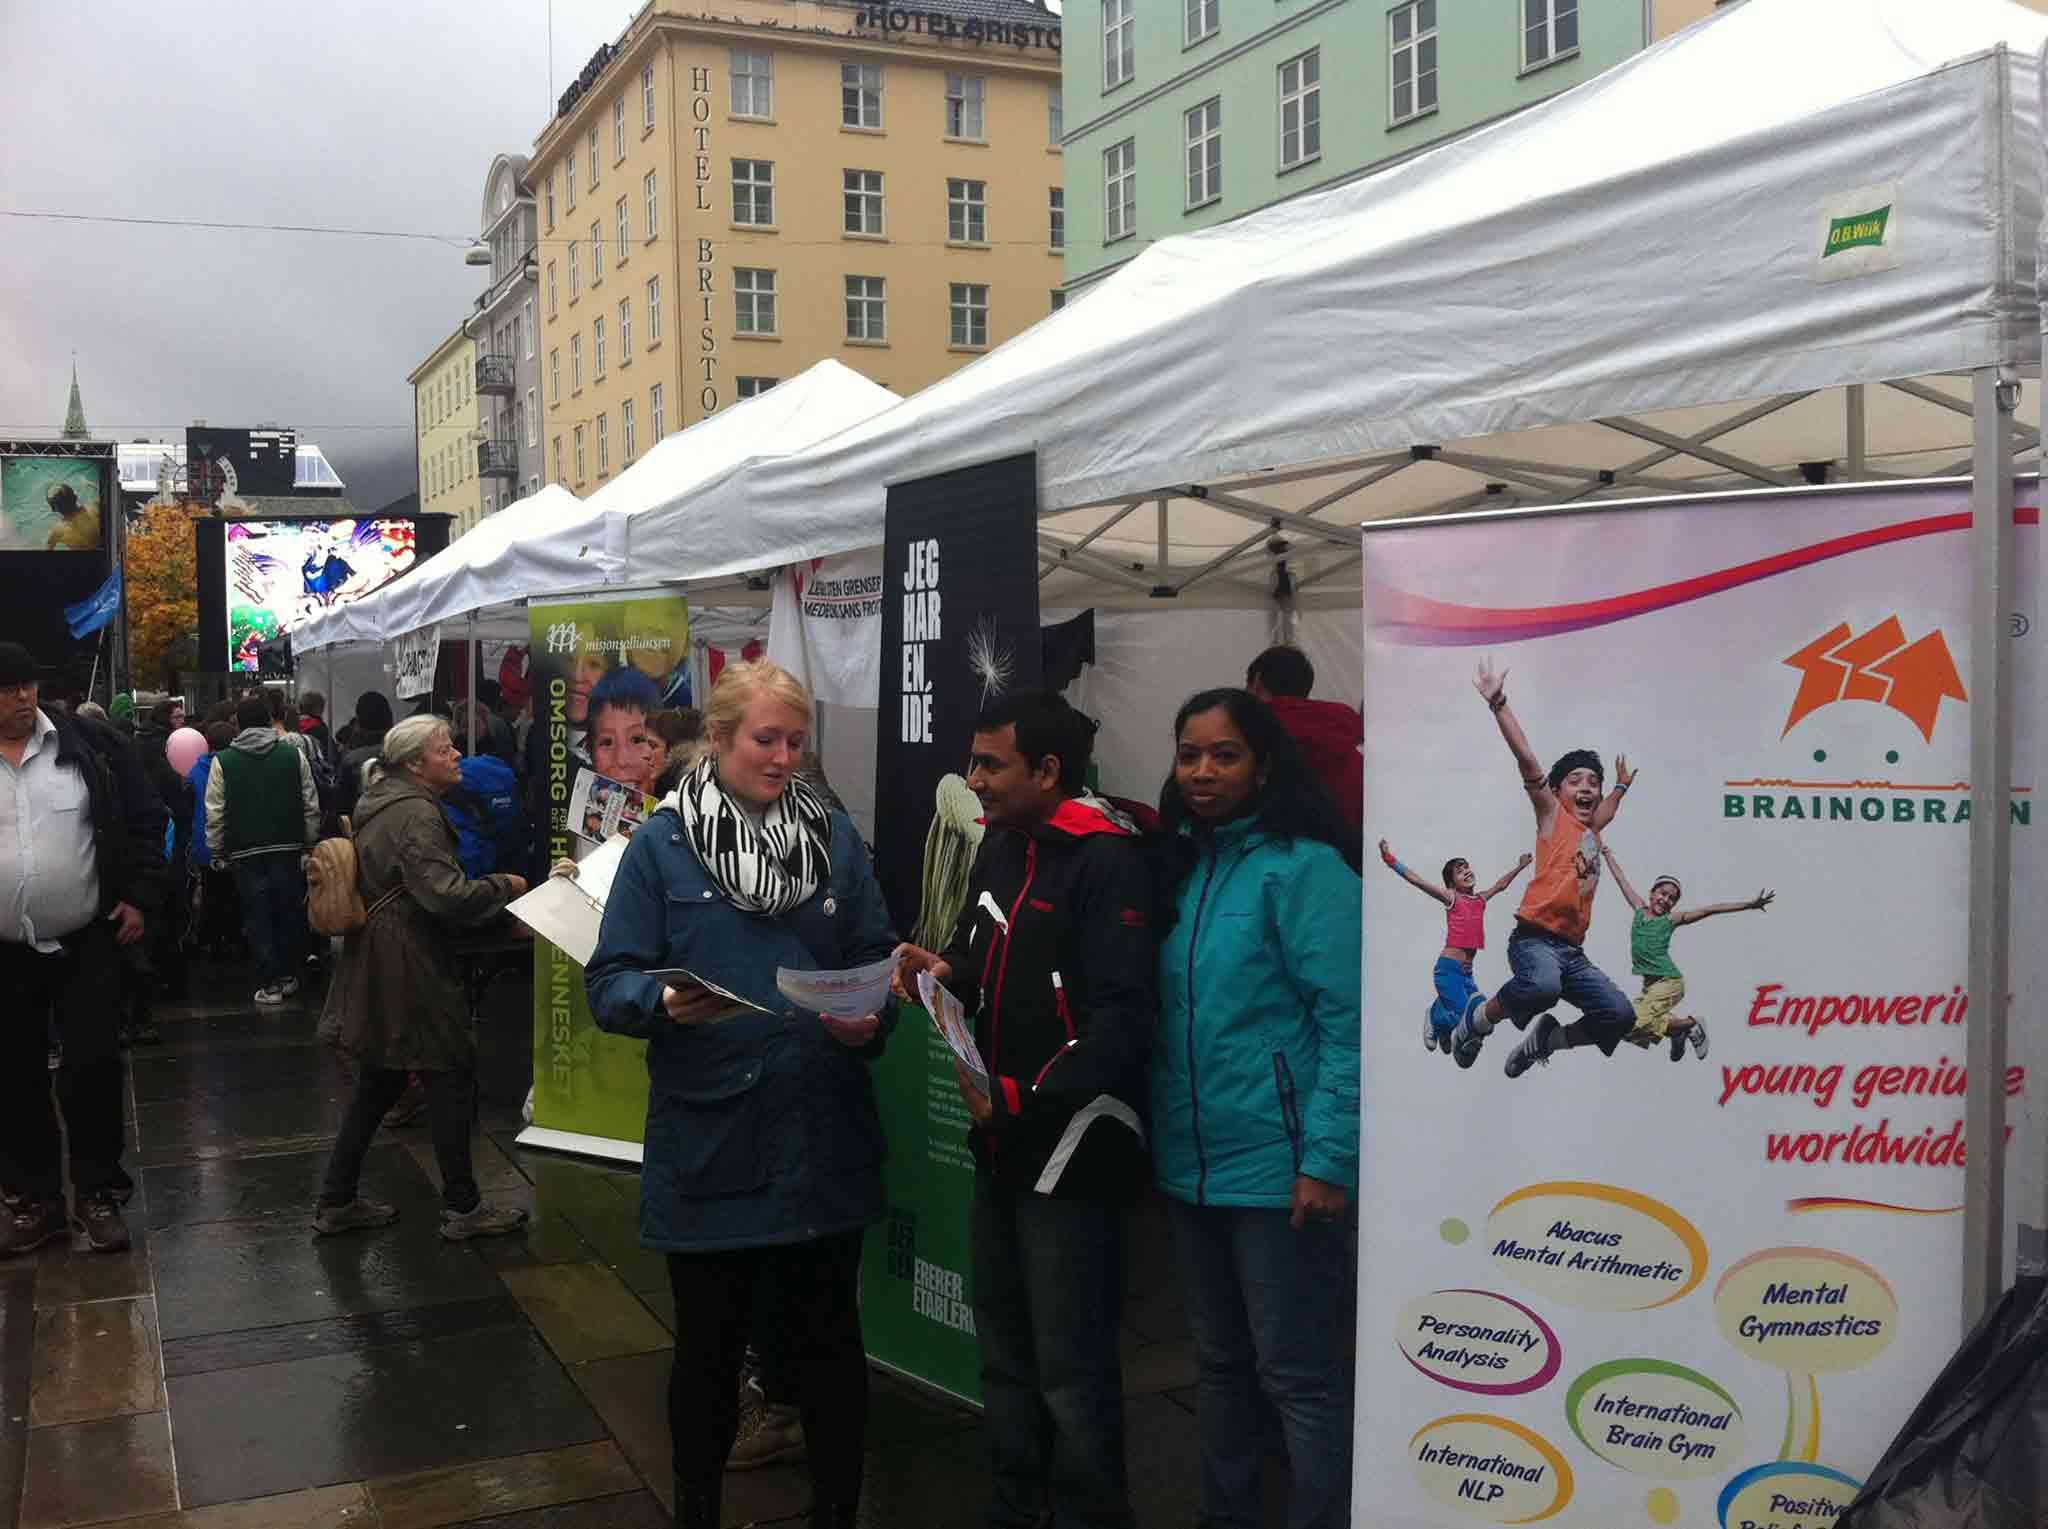 Bergen International Week 2014